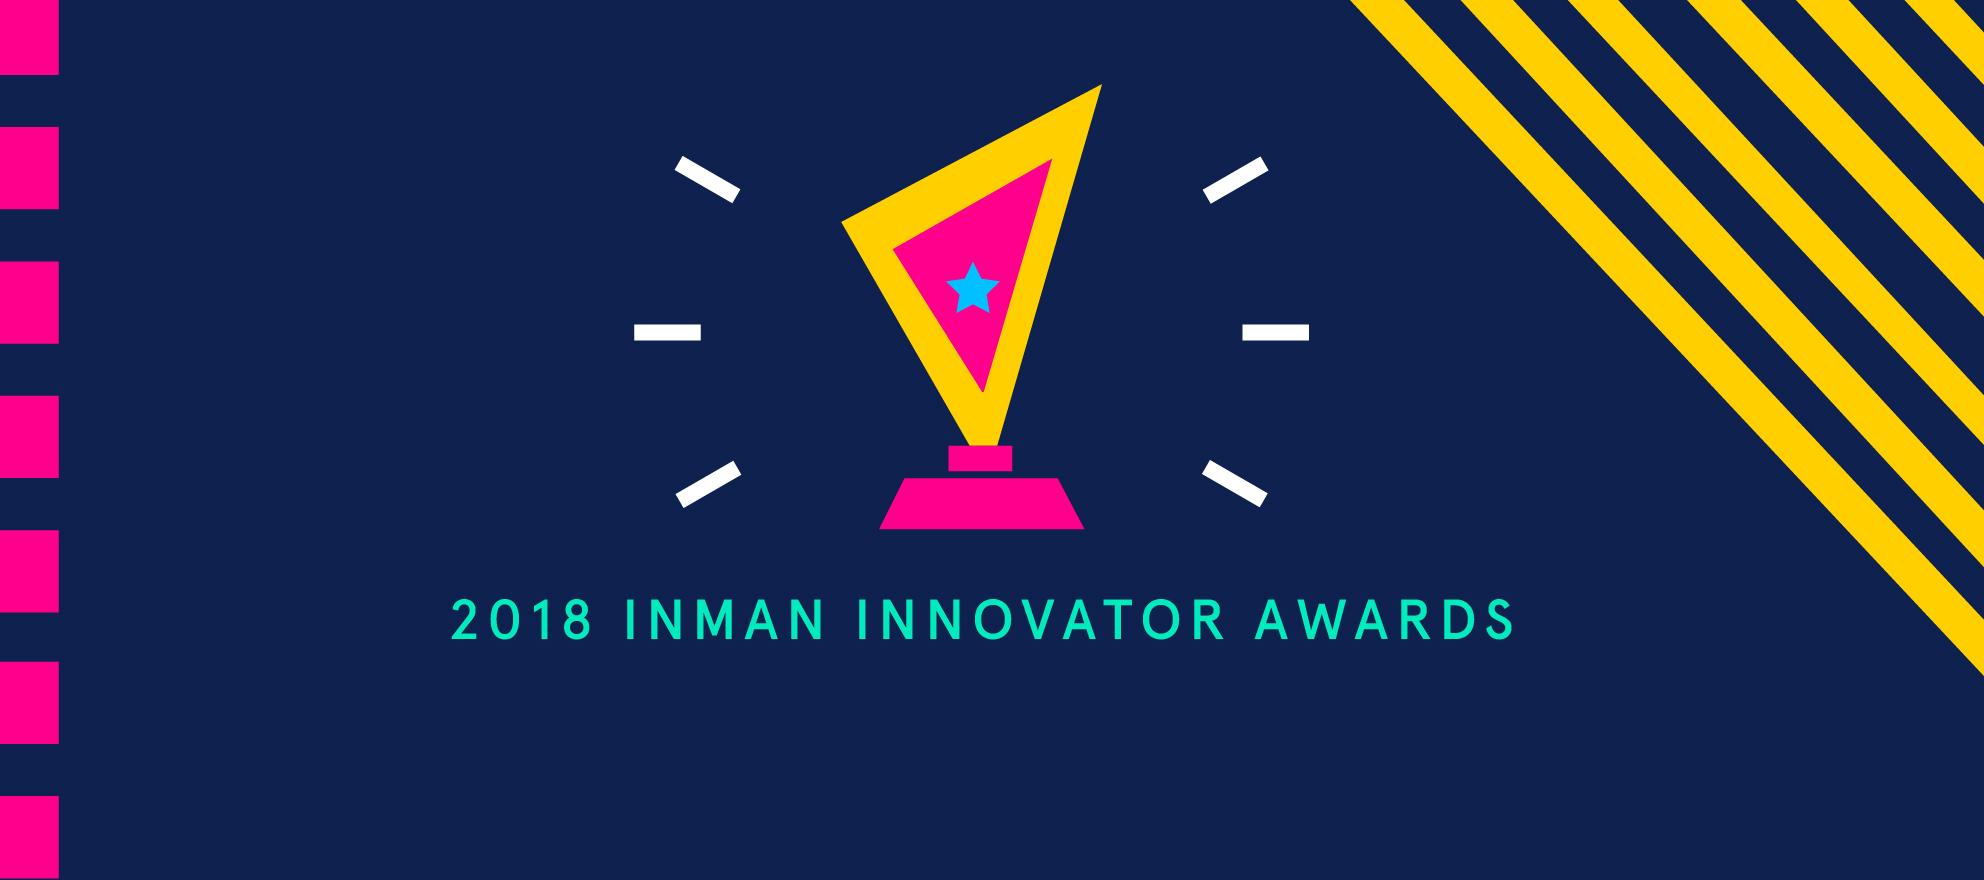 2018 inman innovator awards